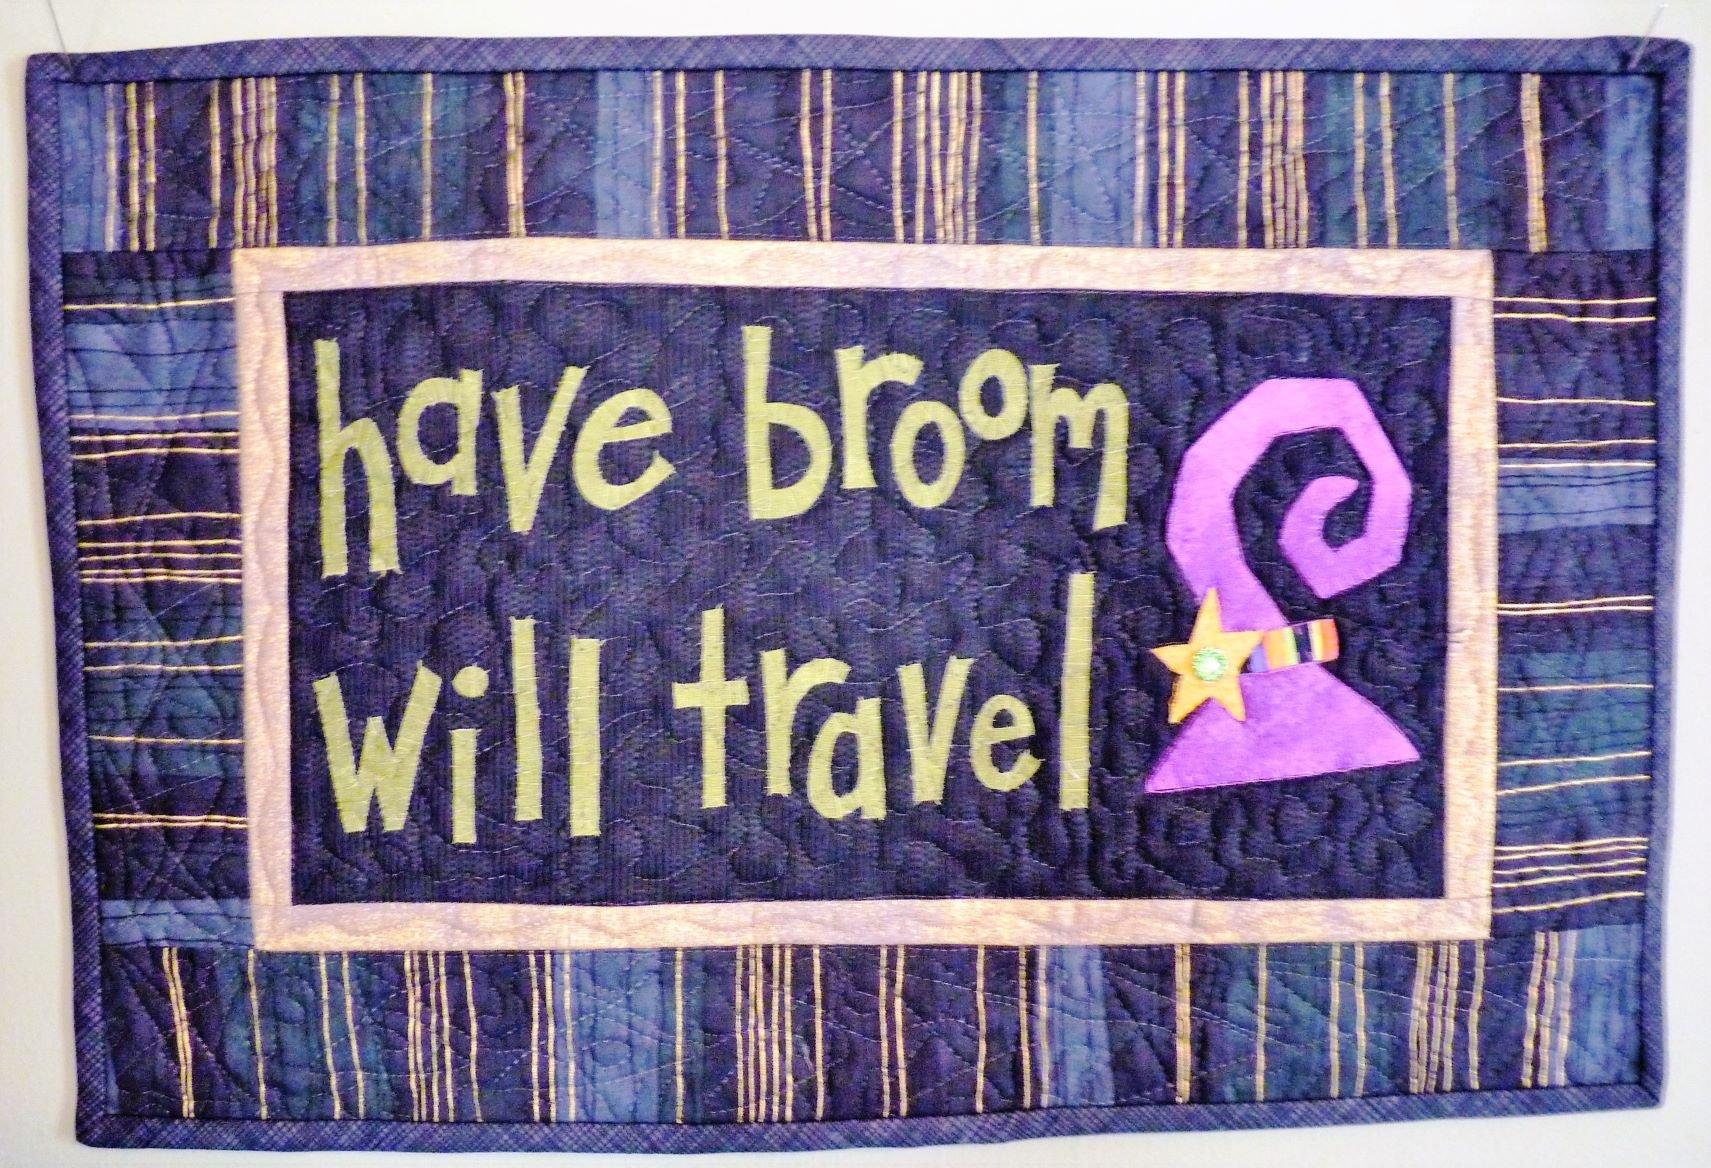 649 Have Broom